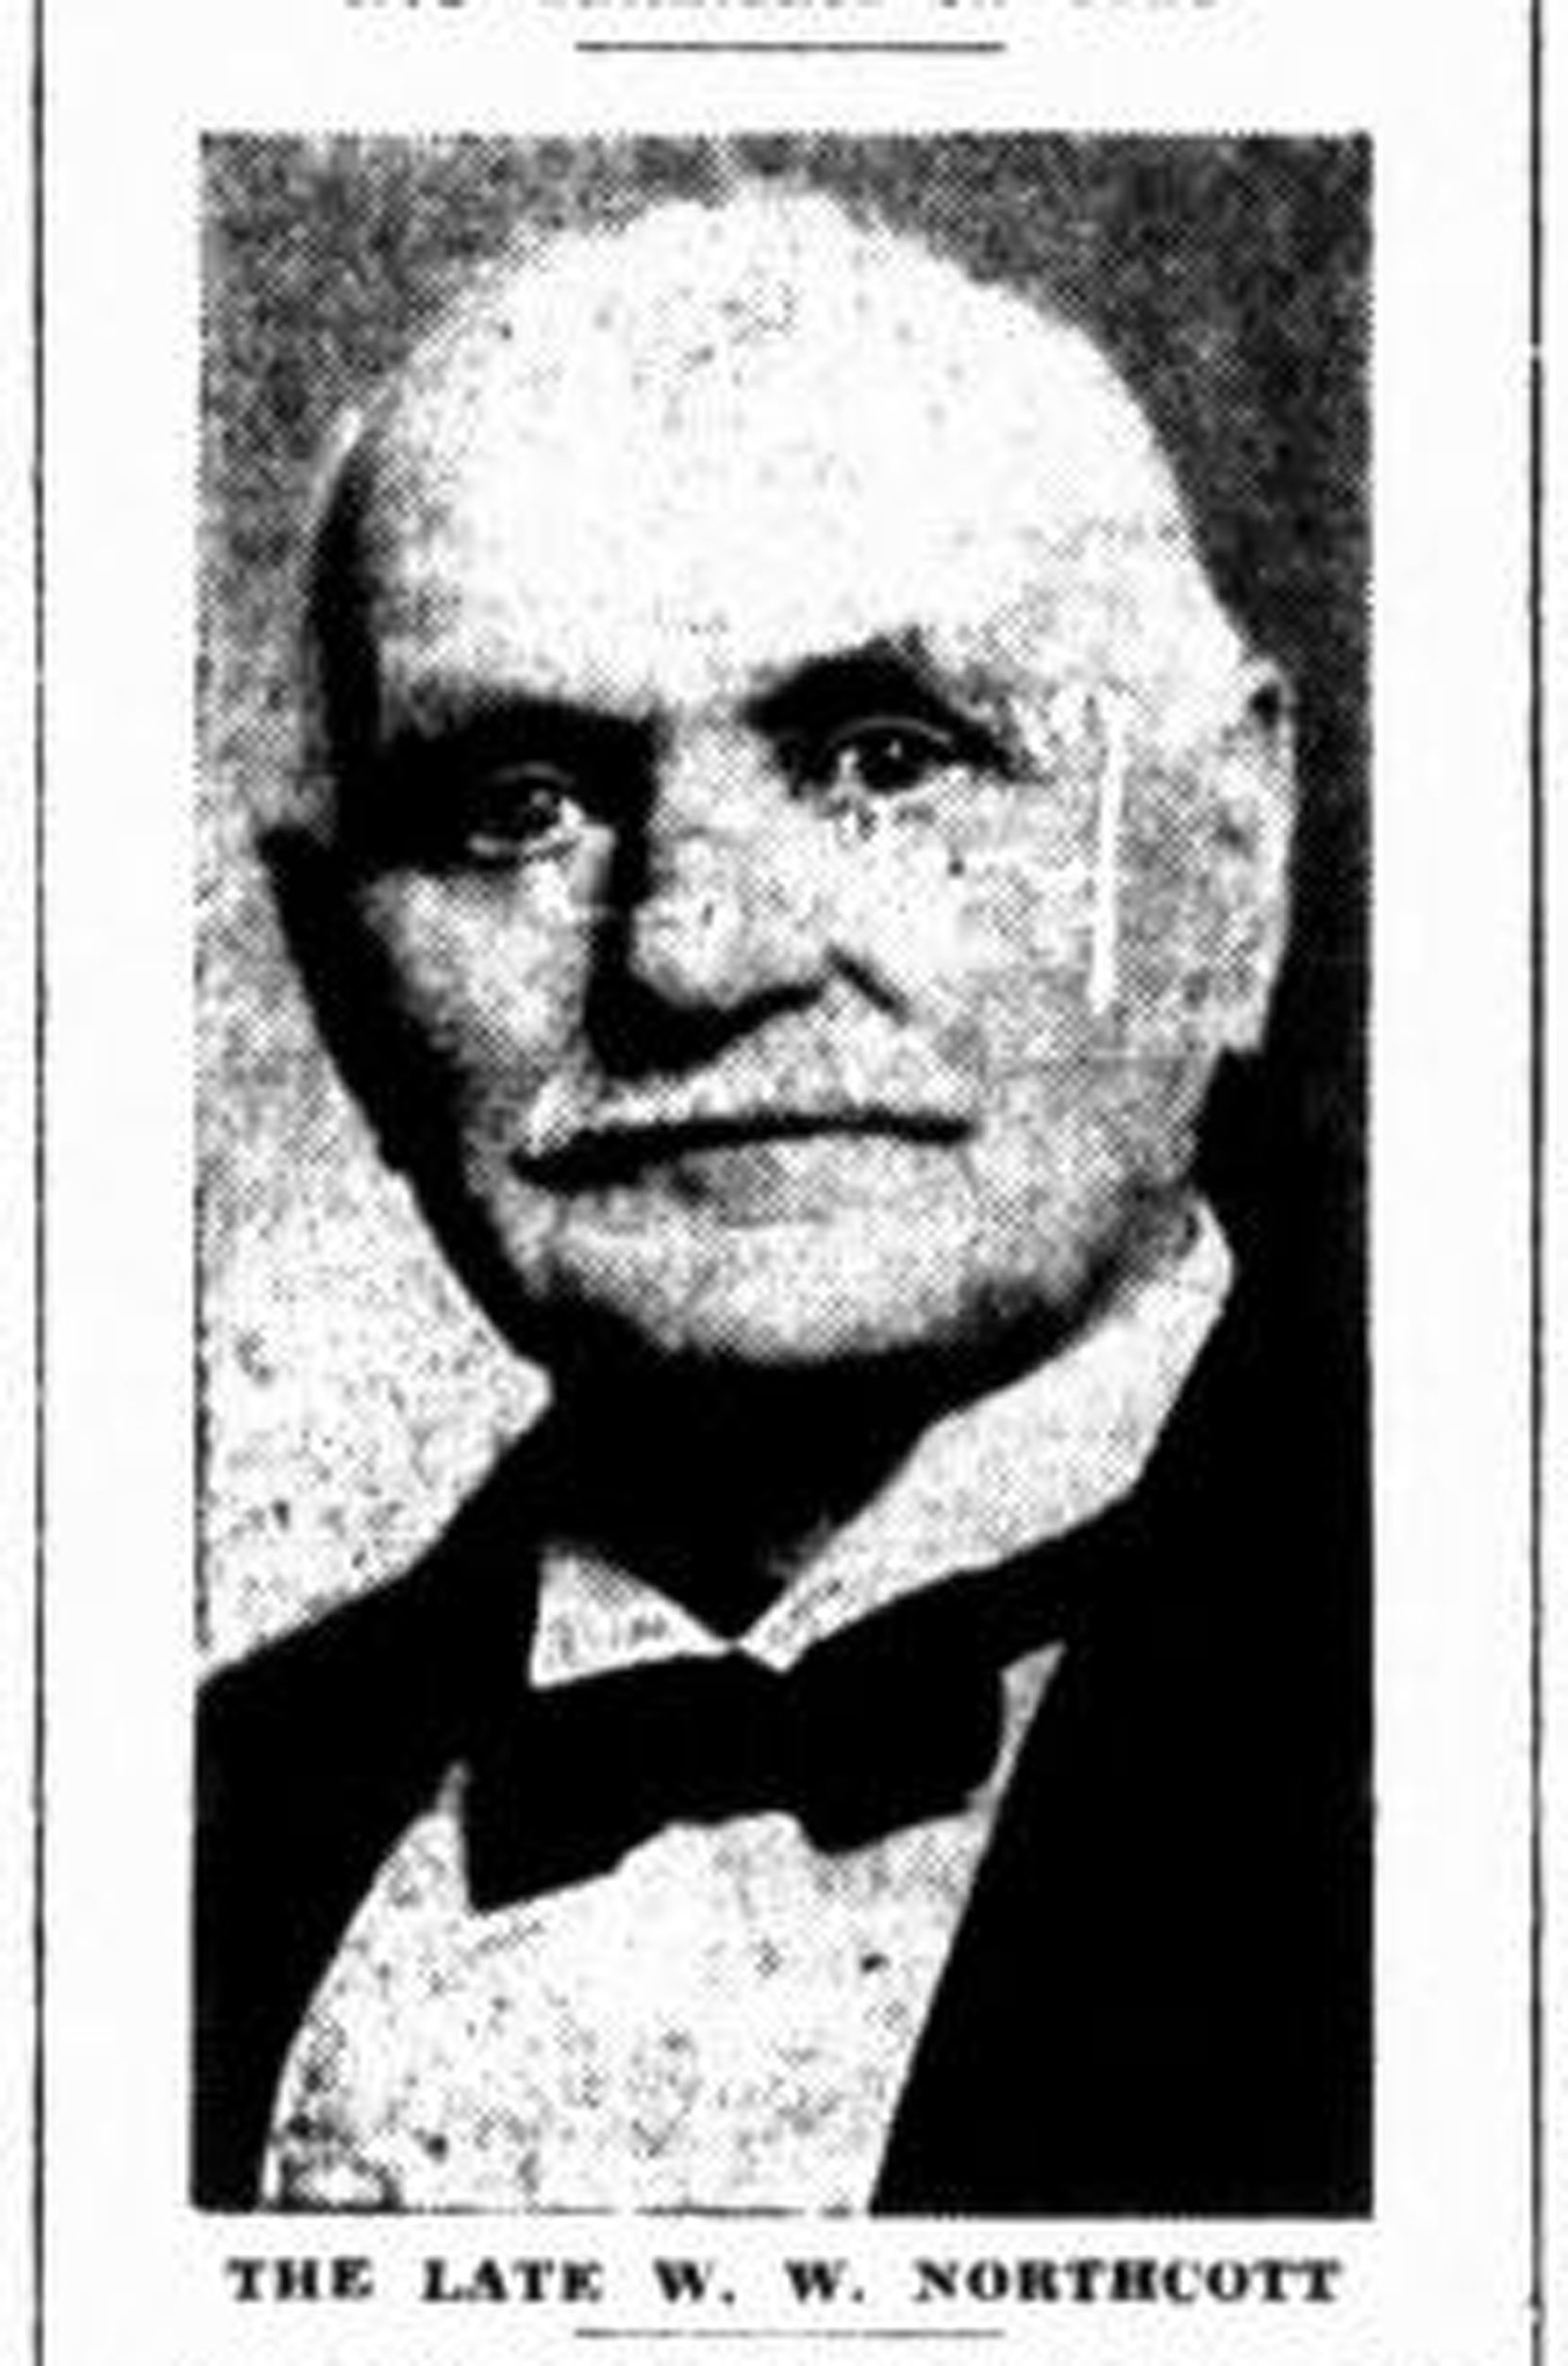 William Walter Northcott, obituary photograph, April 1923